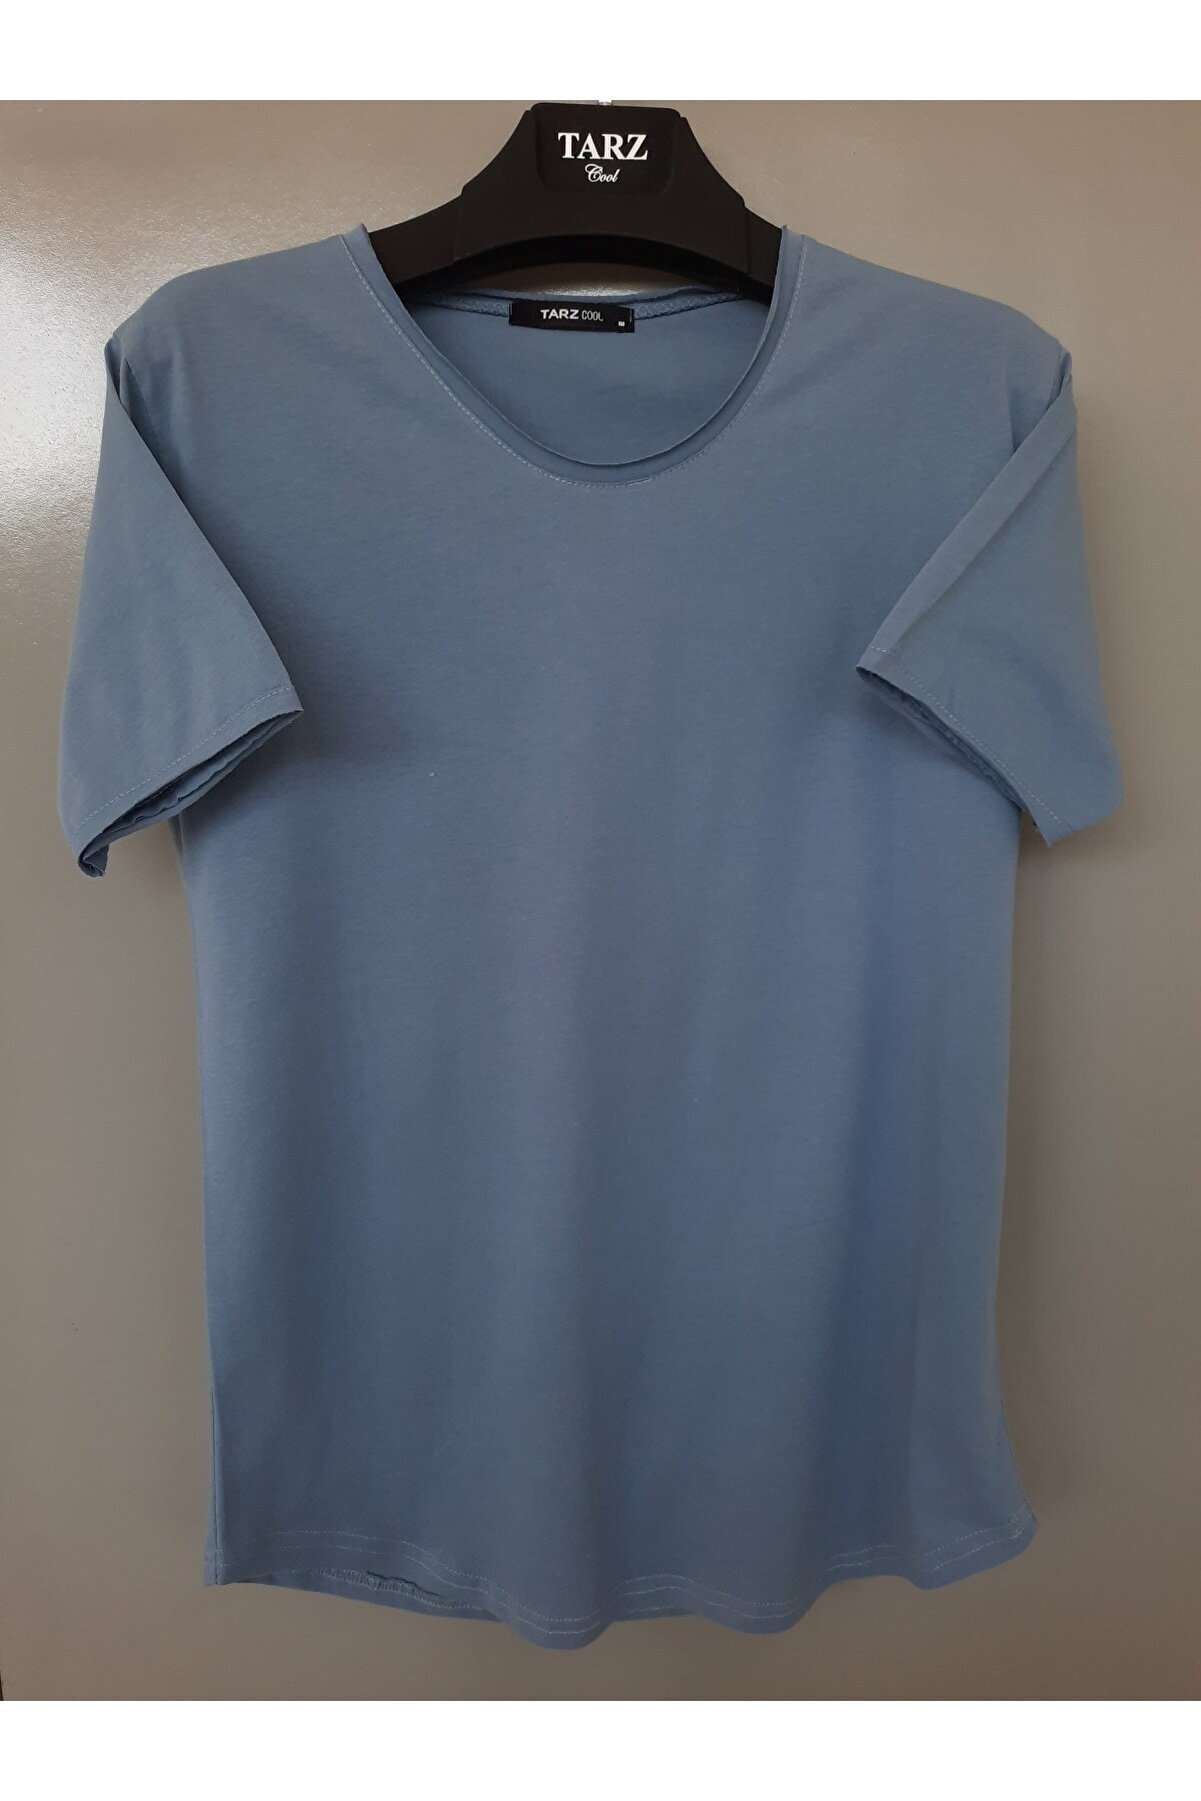 Tarz Cool Erkek Çelik Mavisi Pembe Pis Yaka Salaş T-shirt